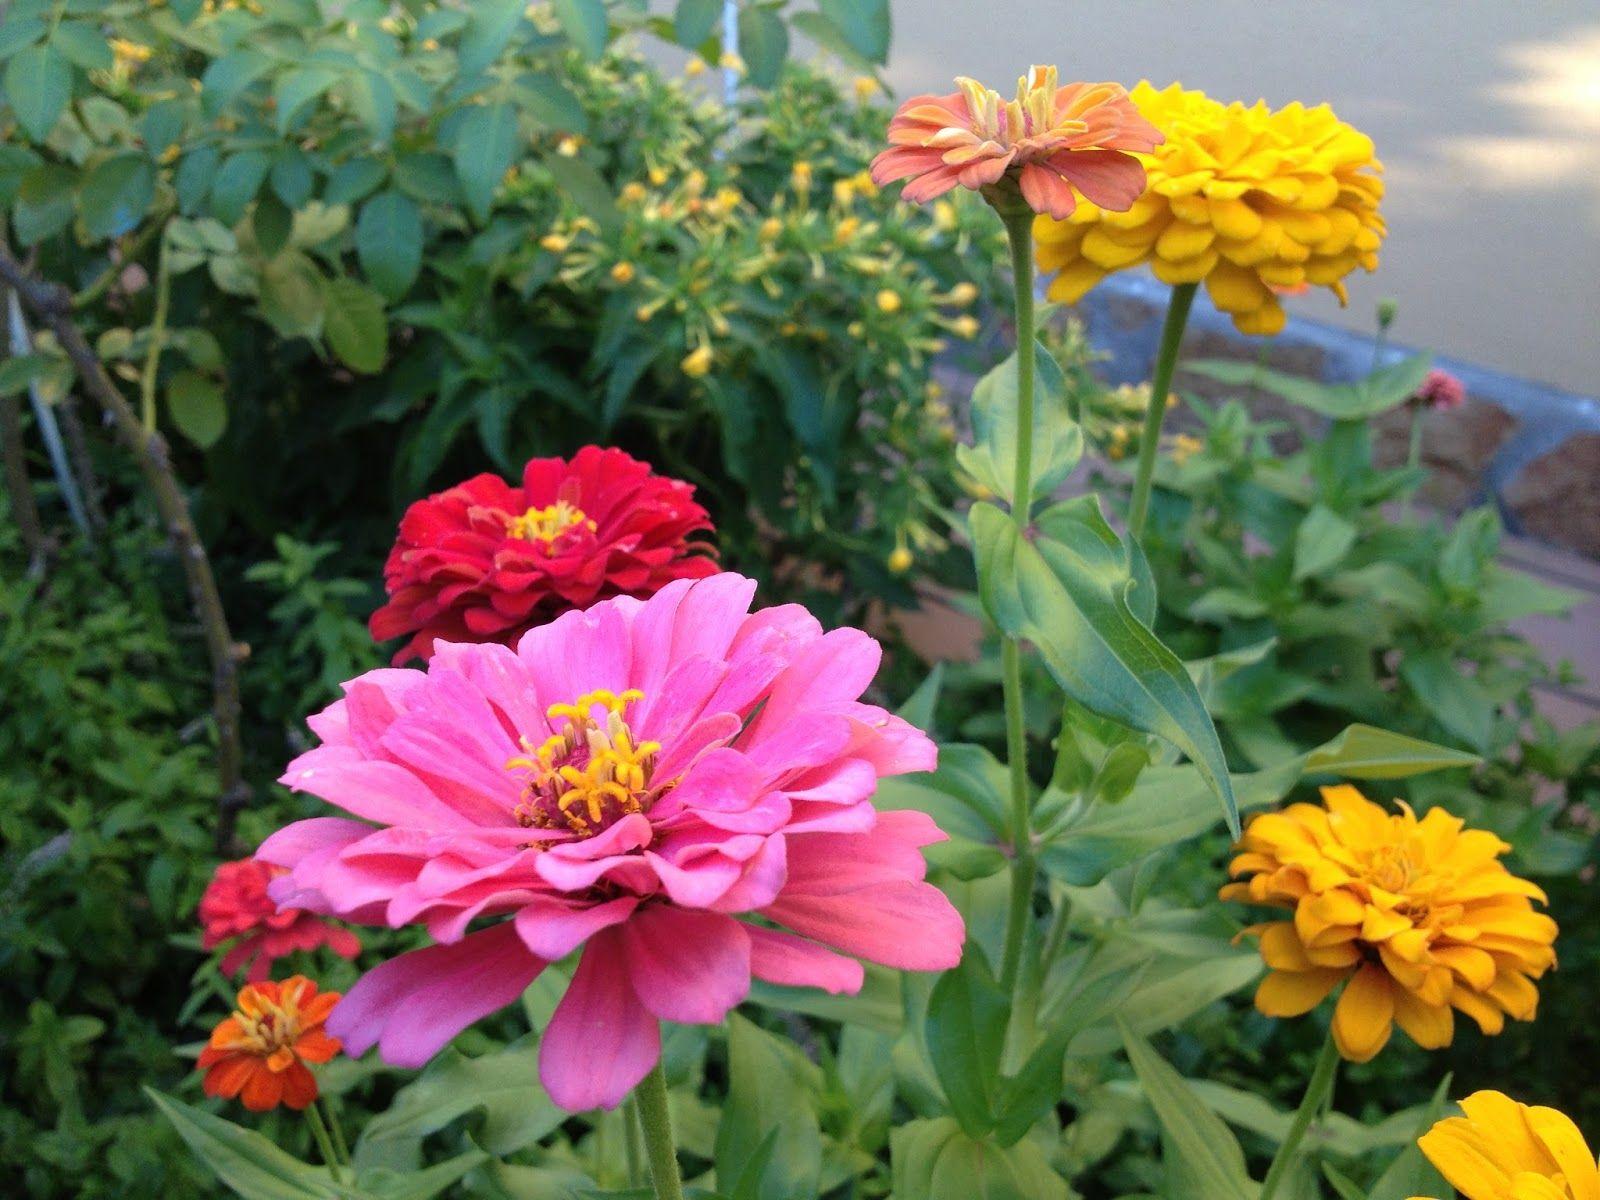 Flores jard n 003 paisajismo y jardineria pinterest for Plantas paisajismo